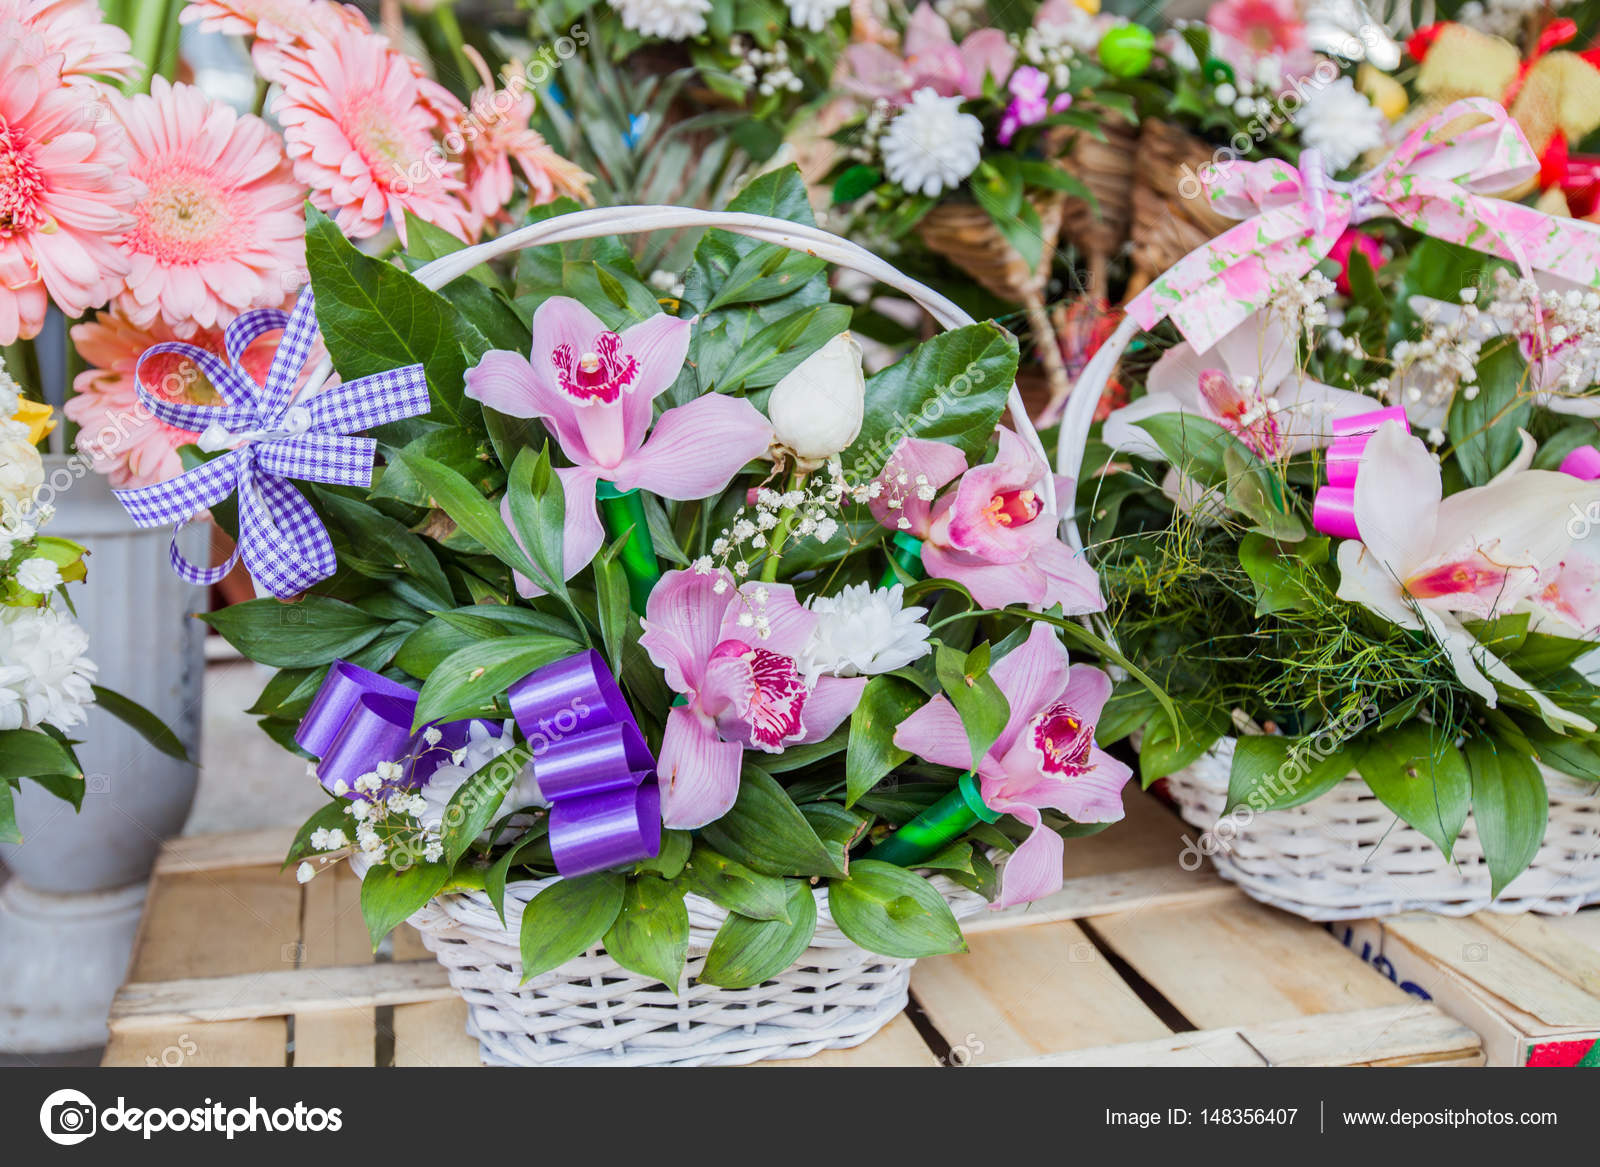 Beautiful flower arrangement stock photo mitastockimages 148356407 beautiful flower arrangement ready for sale on flowers market photo by mitastockimages izmirmasajfo Images